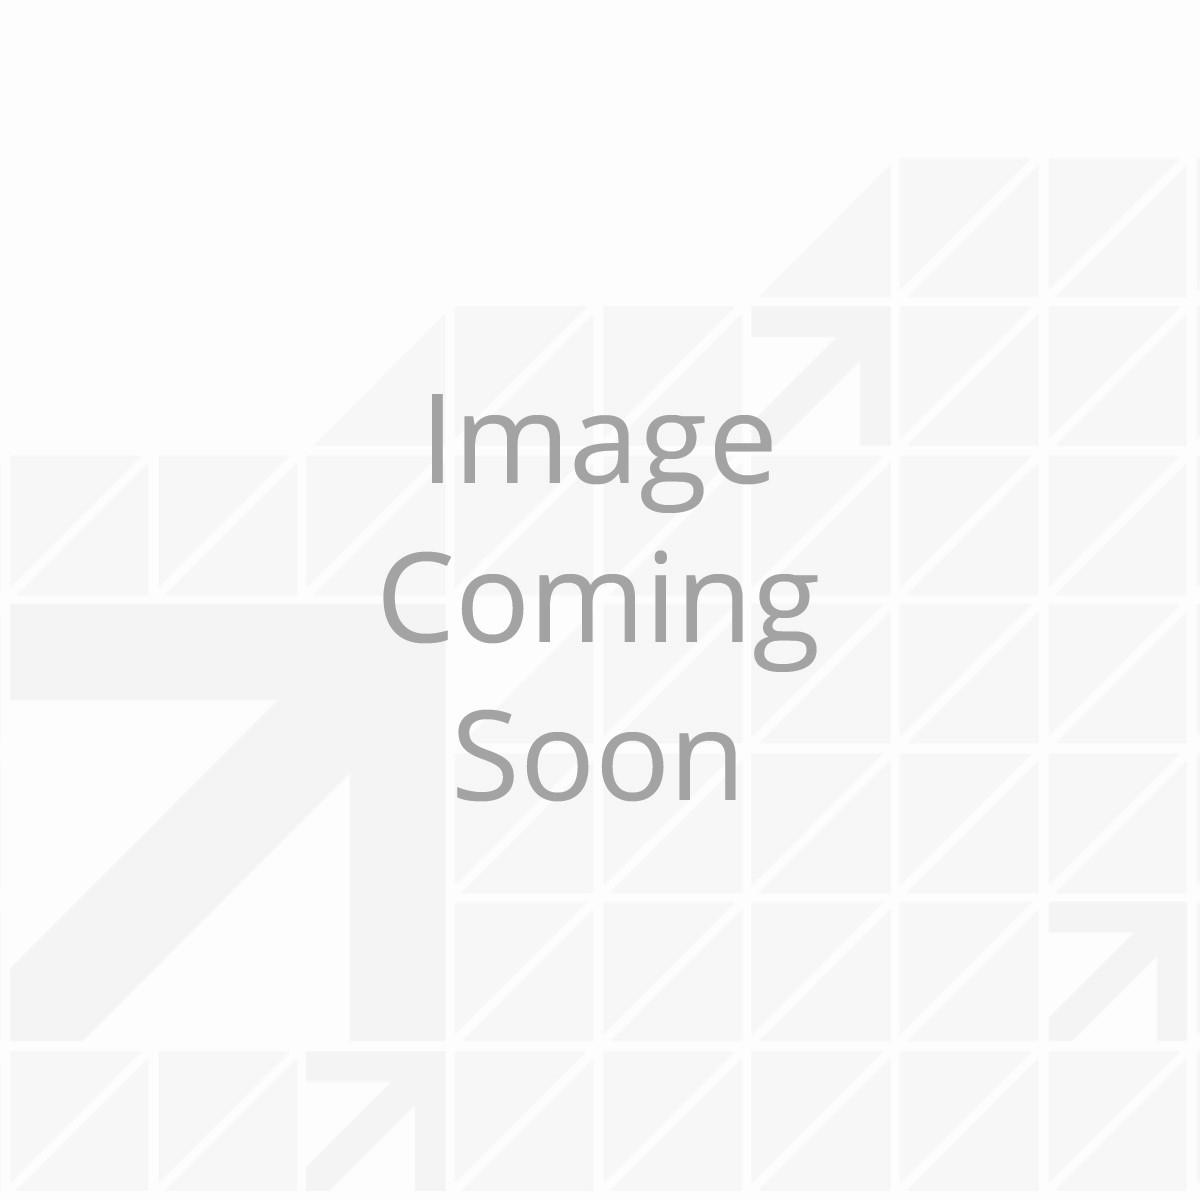 3 Room Manifold & Valves (w/o Plate)